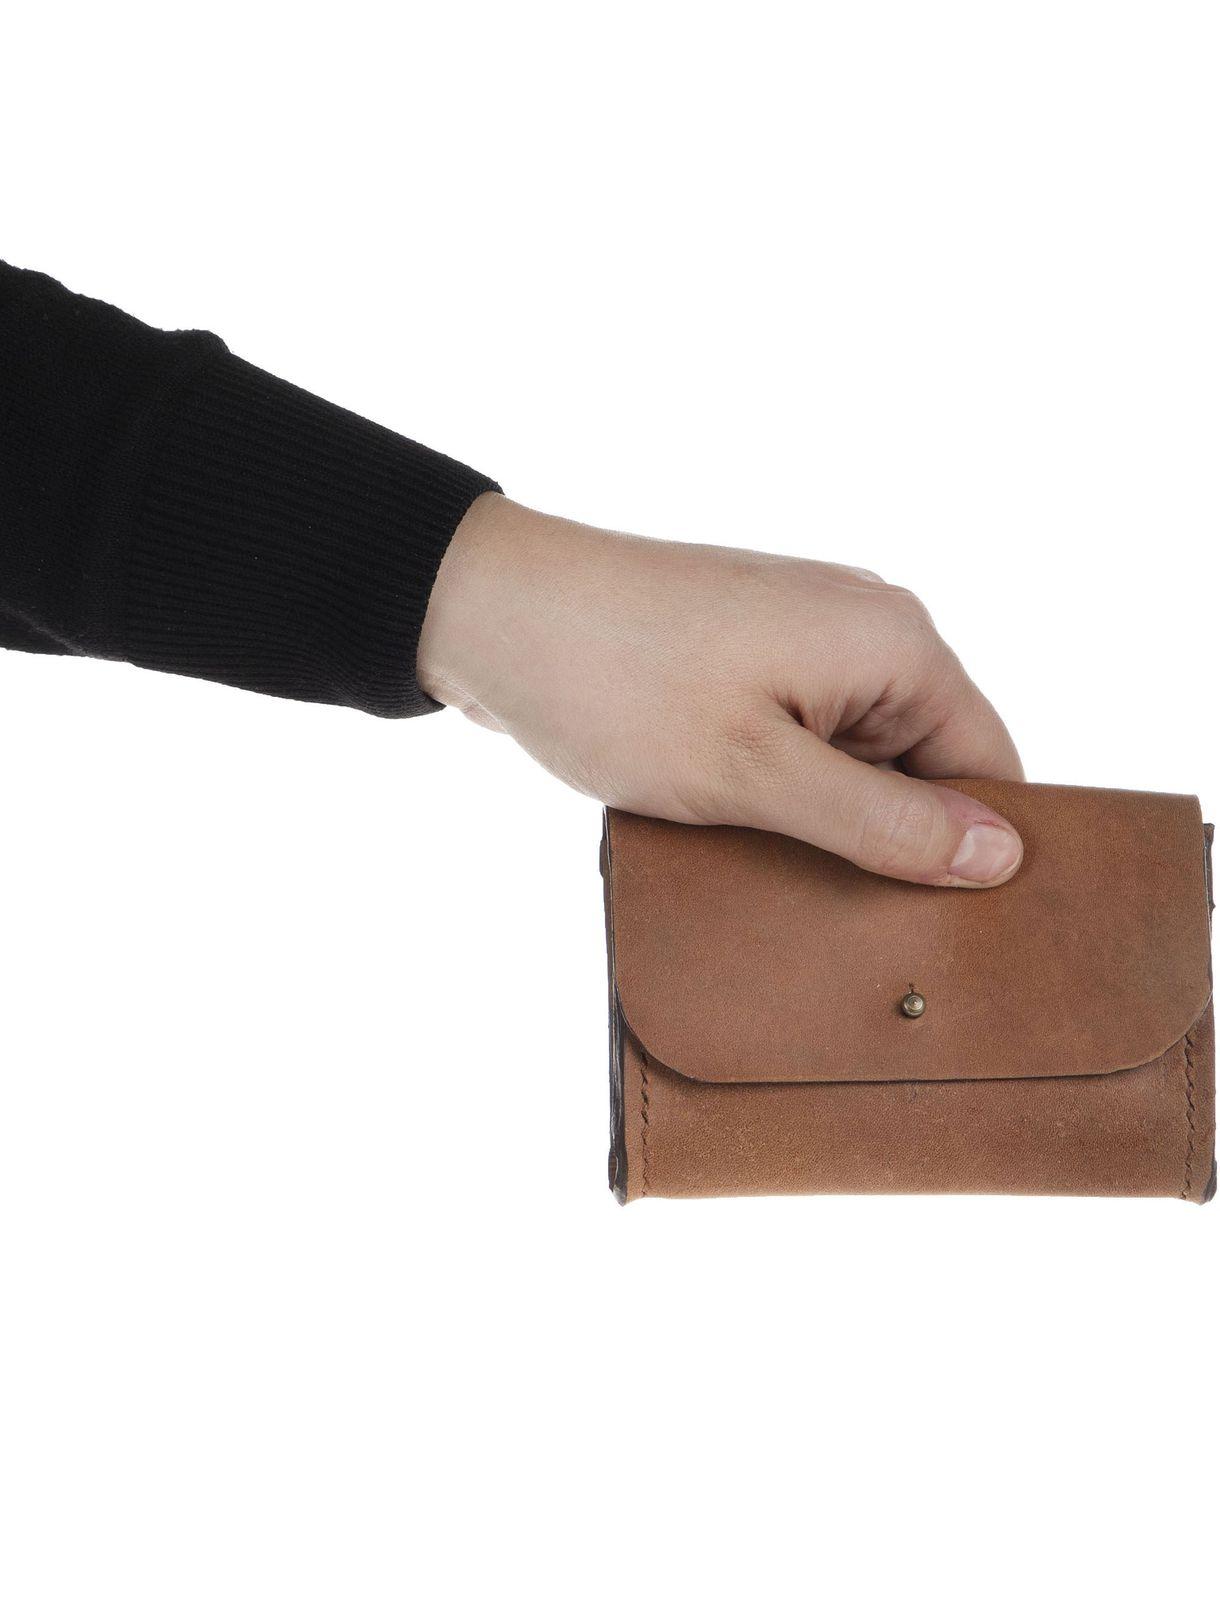 کیف کارت اعتباری چرم بزرگسال - چرم لانکا تک سایز main 1 5